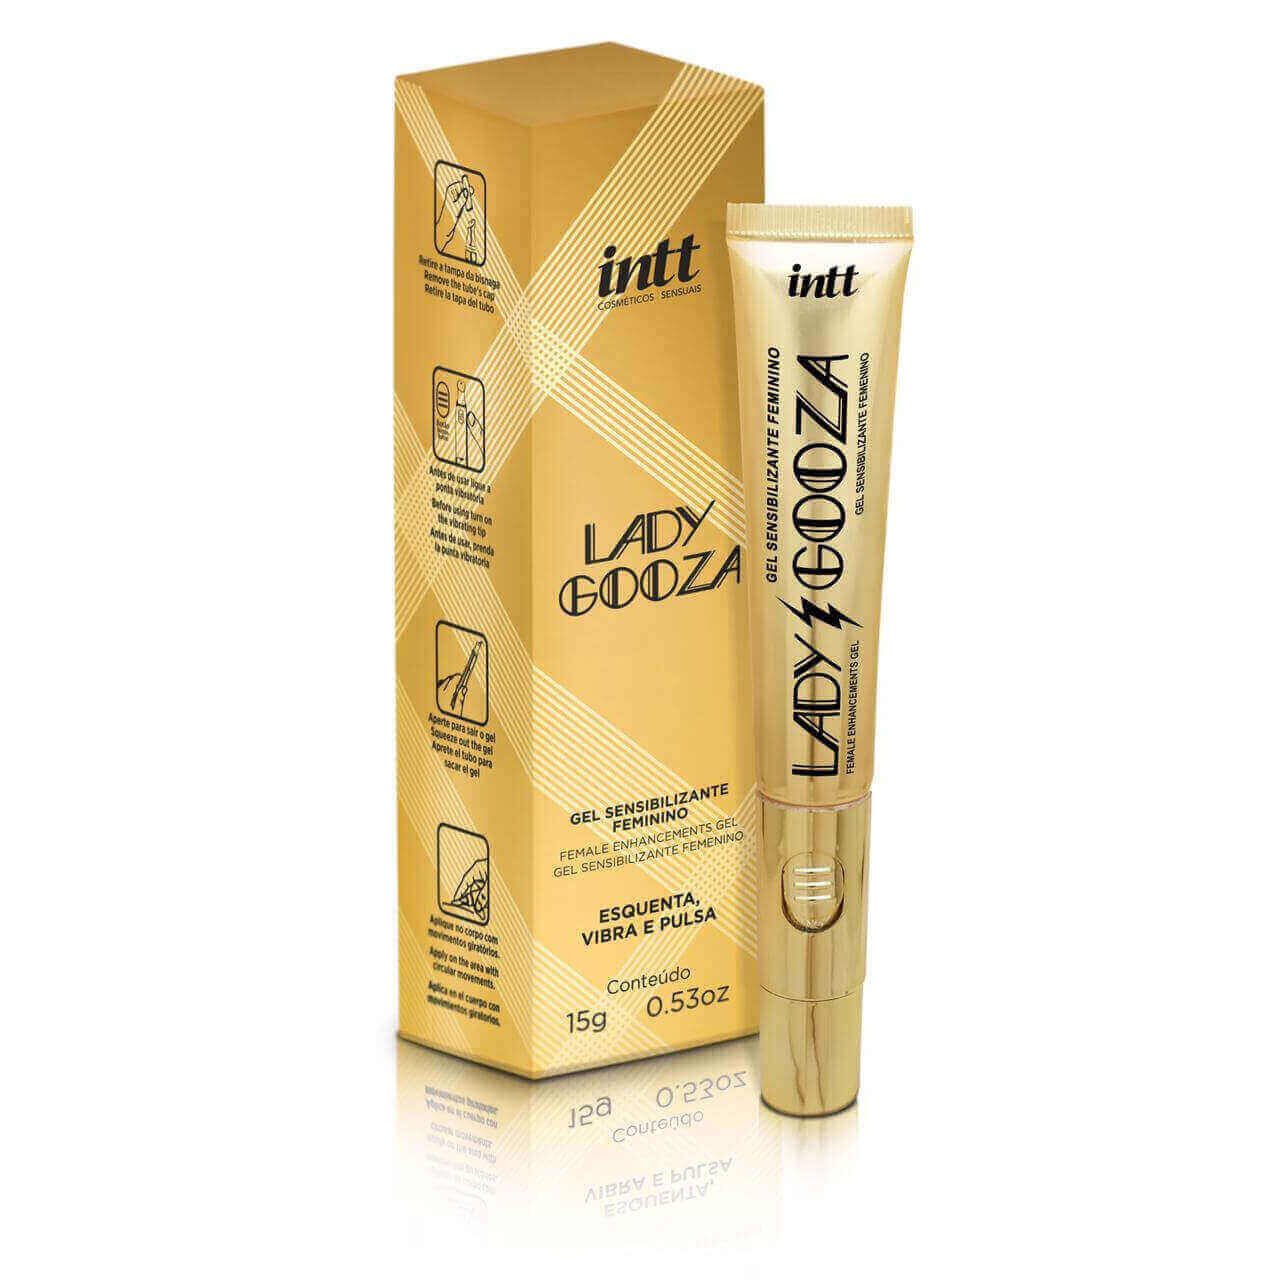 Intt Lady Gooza - gel excitante com sabor tutti frutti e 7 funções R$ 99,90. Foto: Exclusiva Sex